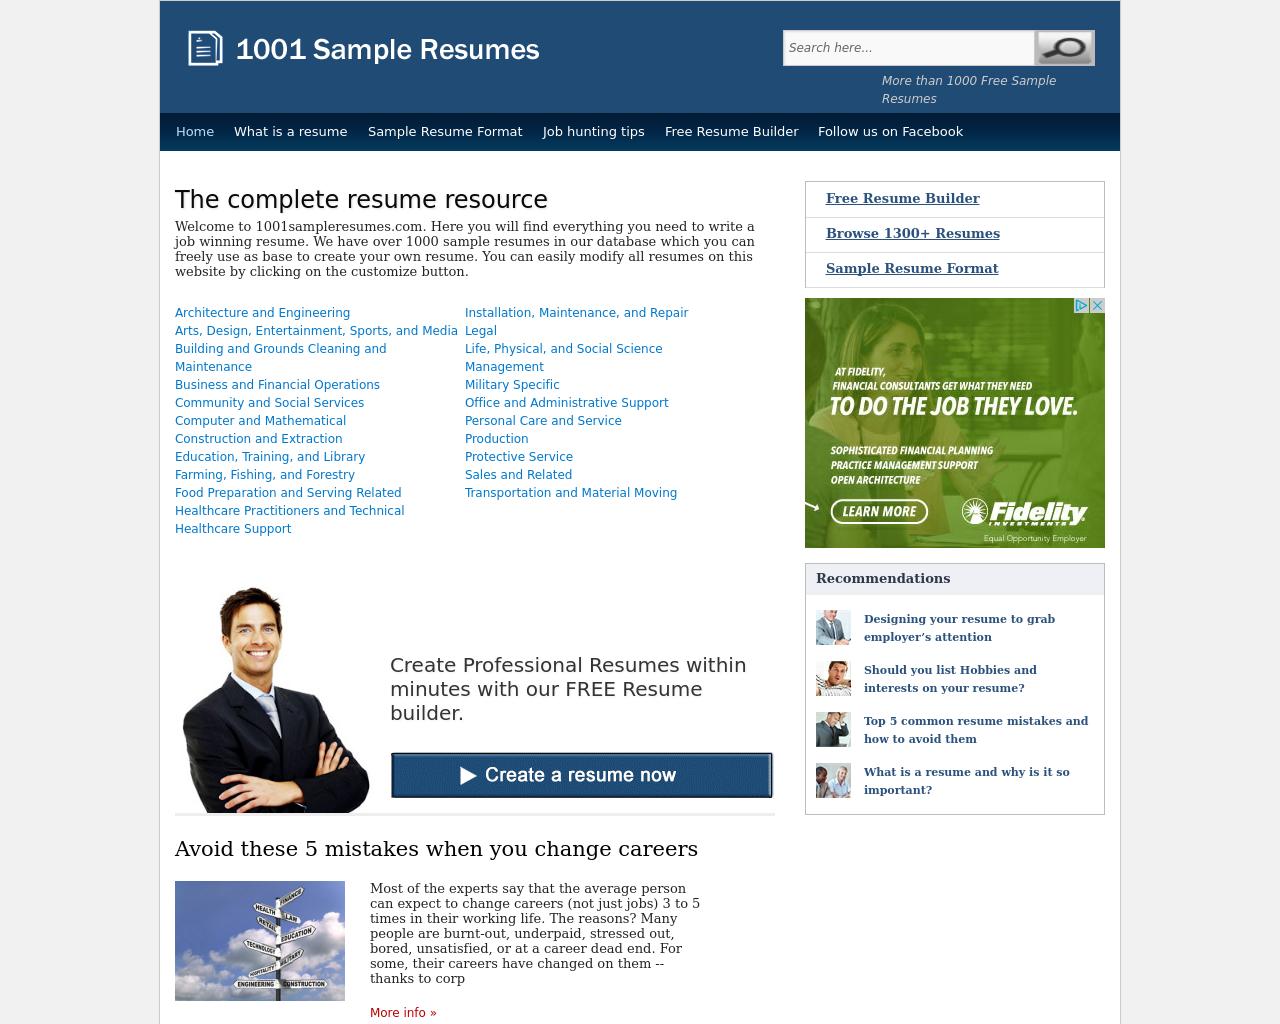 1001-Sample-Resumes-Advertising-Reviews-Pricing